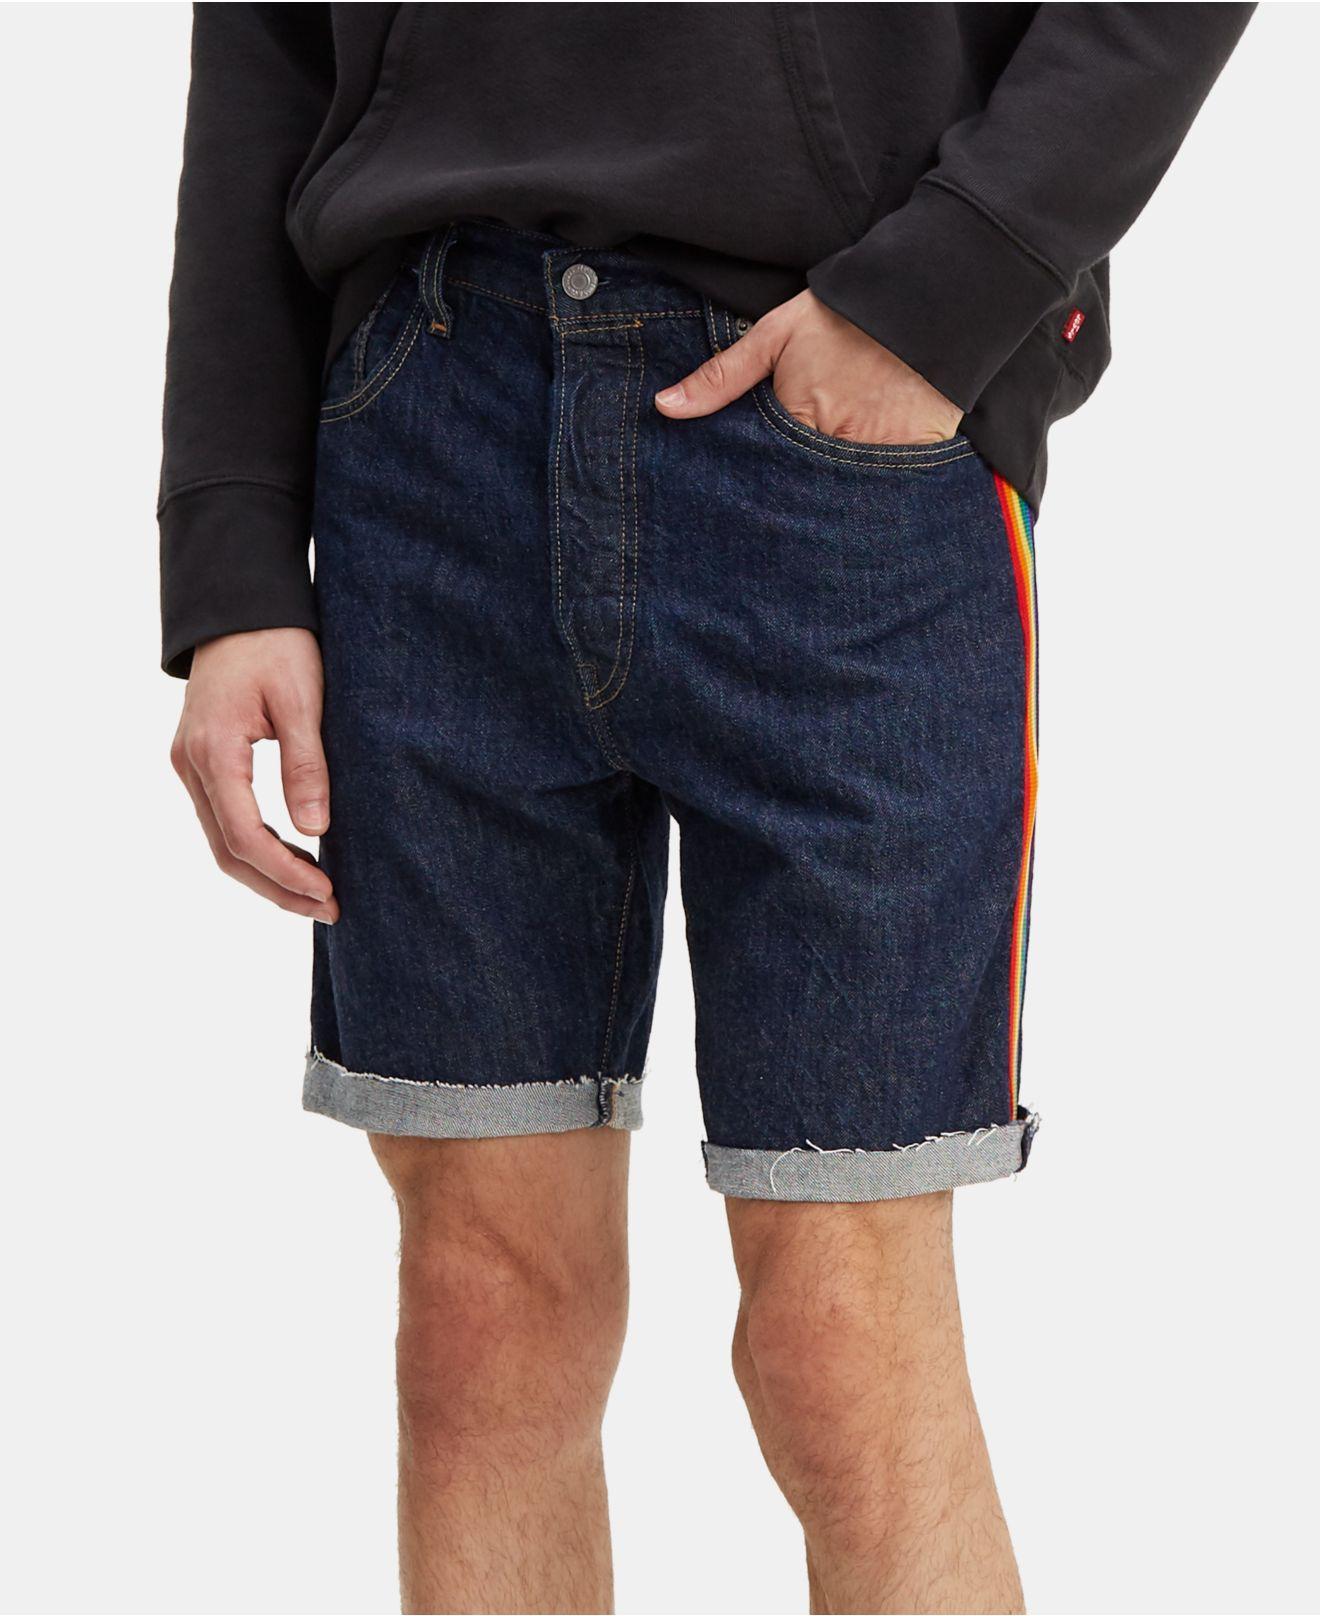 e67d7a00 Levi's - Blue ® Pride Collection 501 Denim Shorts for Men - Lyst. View  fullscreen